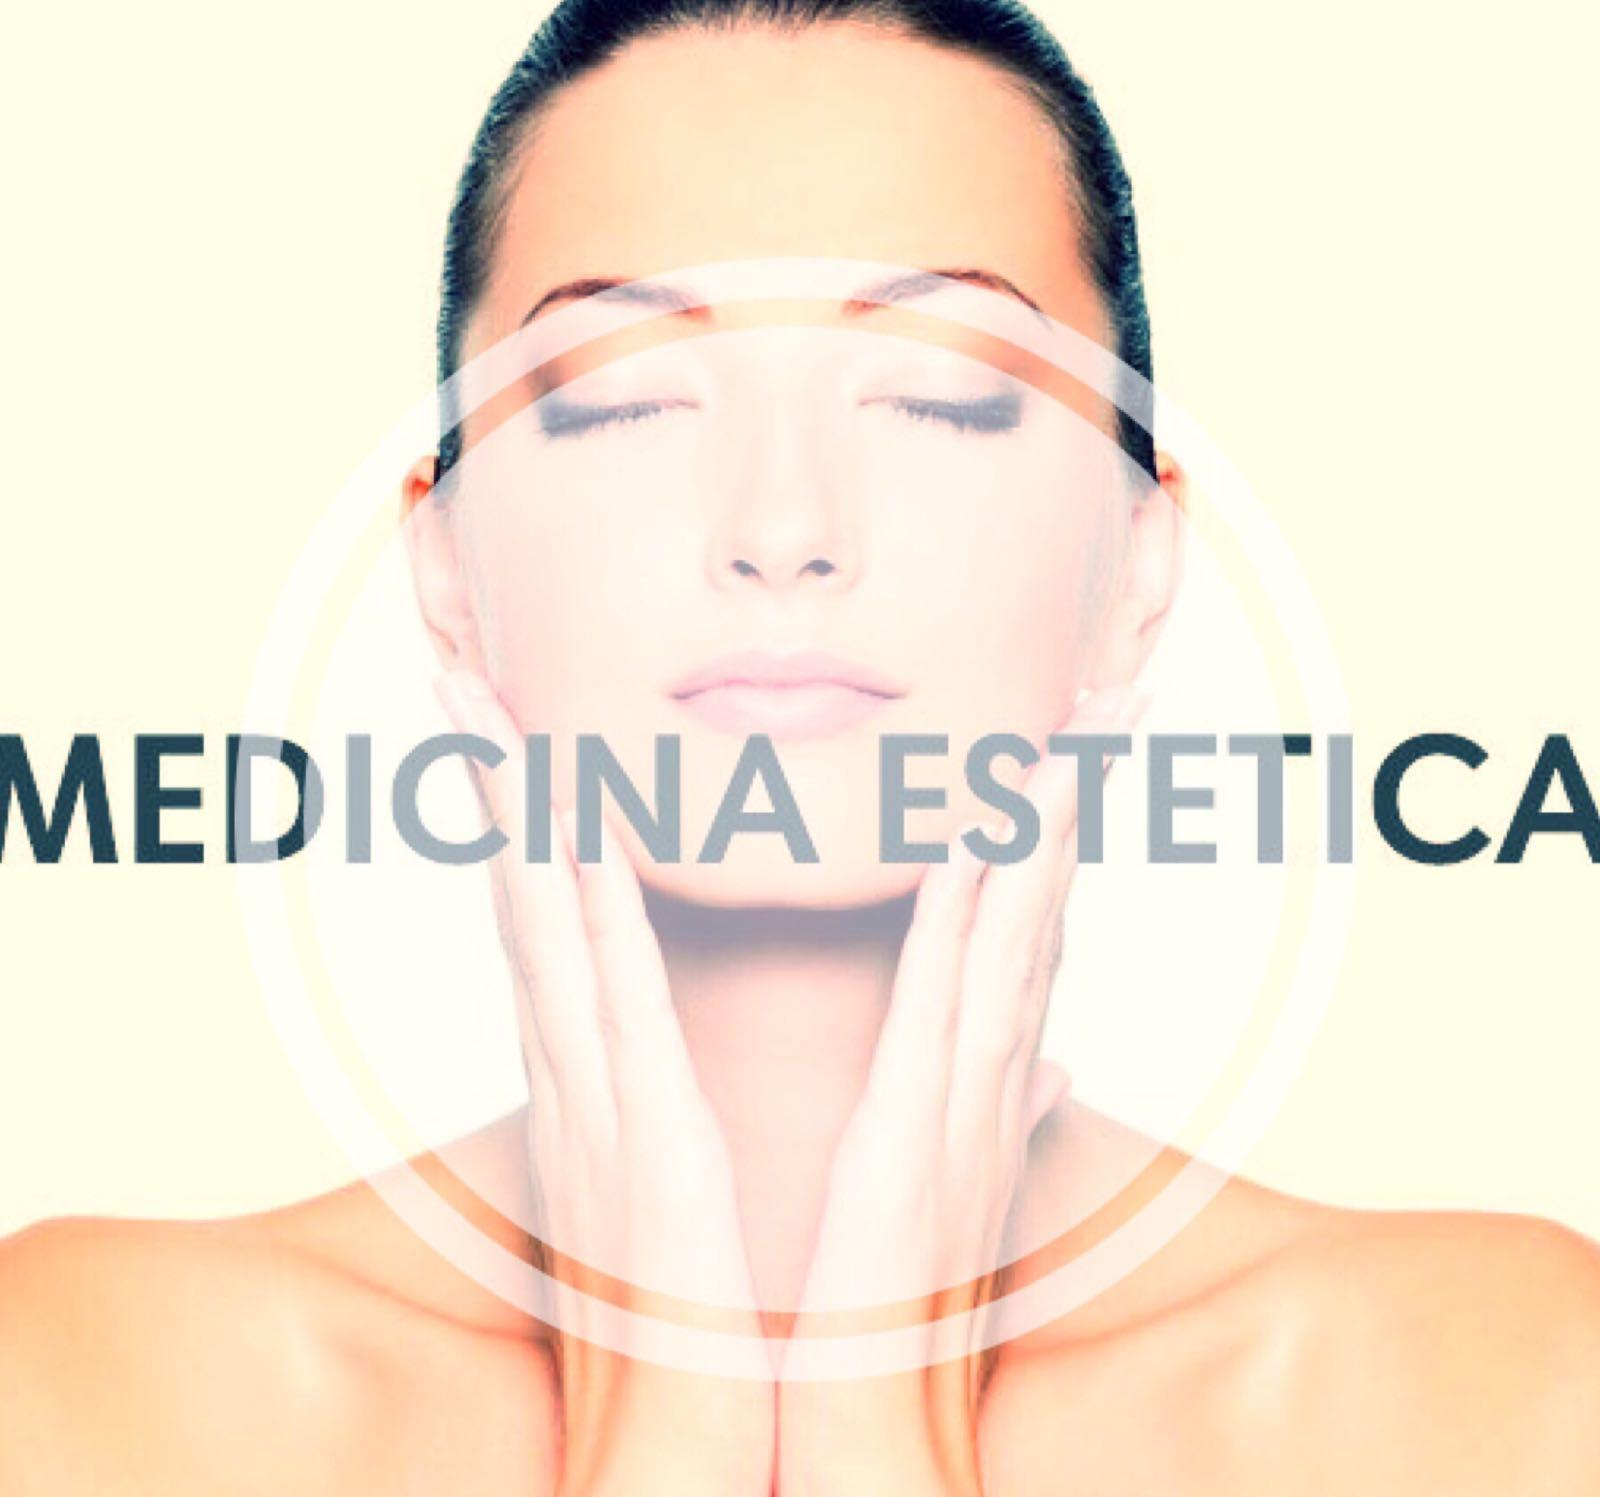 medicina-estetica-sabina-medica-palombara-sabina